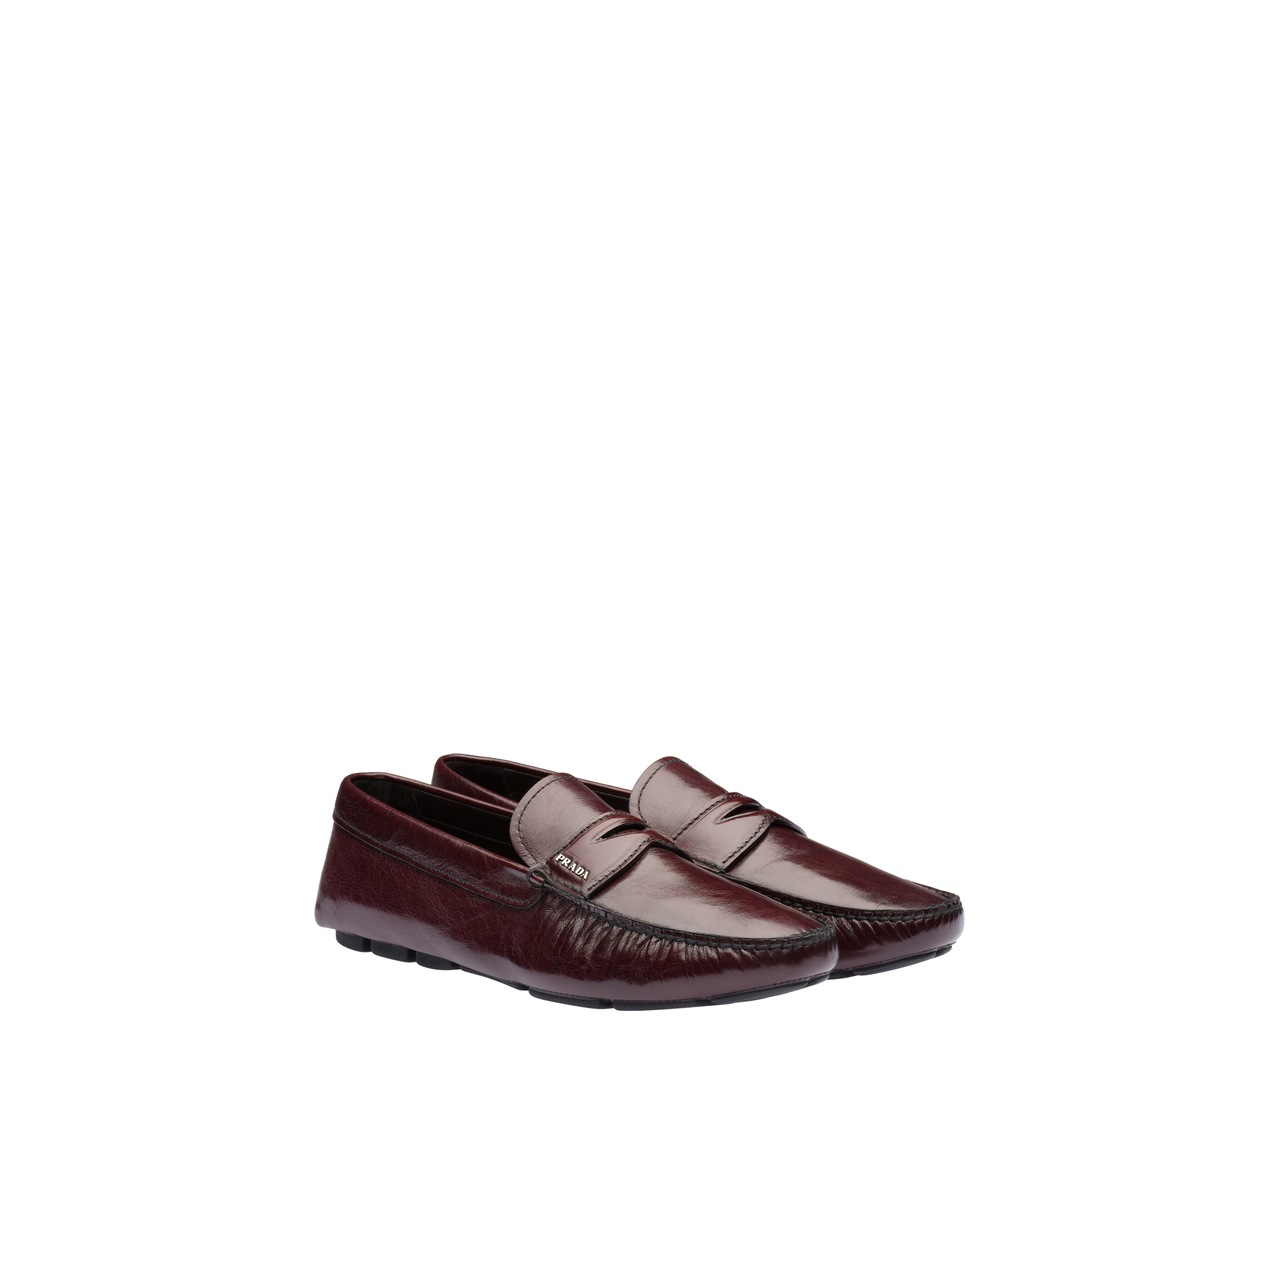 Kangaroo leather loafers